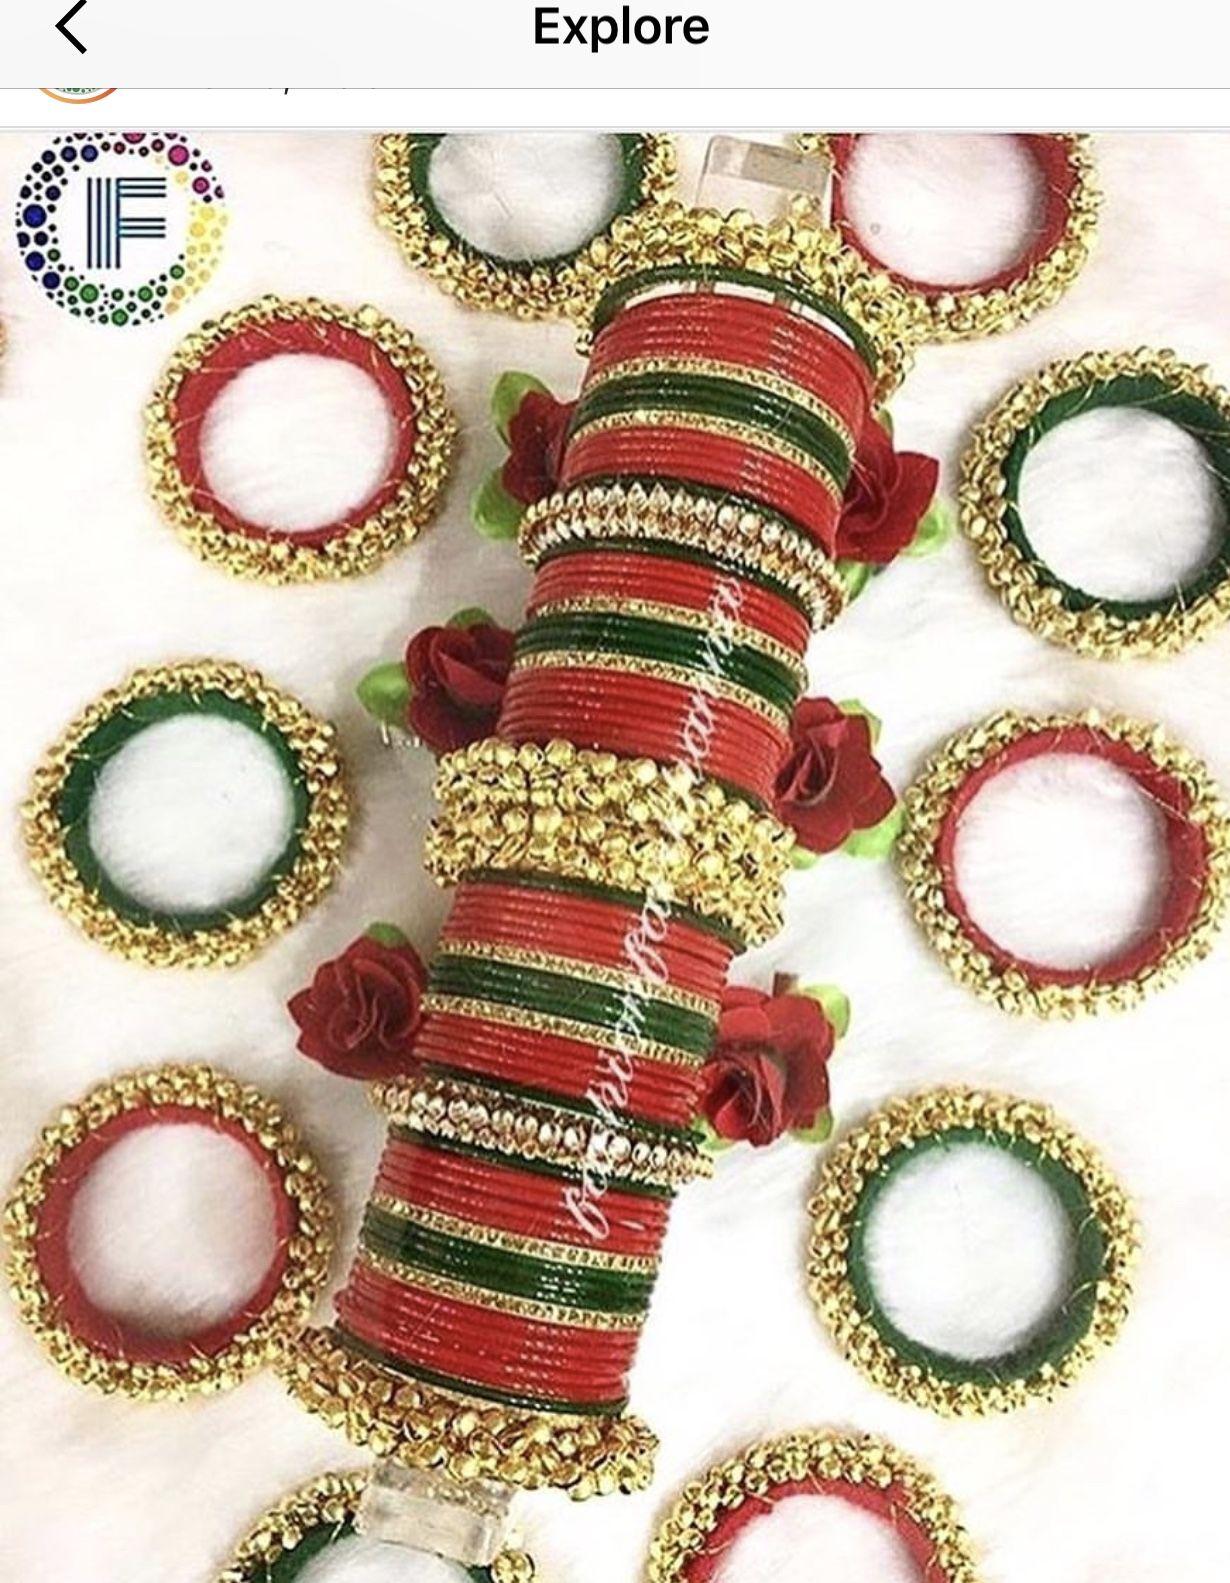 Bangle Ceremony Wishes : bangle, ceremony, wishes, Bangle, Ceremony, 😜😍😍😍😍, Ceremony,, Bridal, Bangles,, India, Wedding